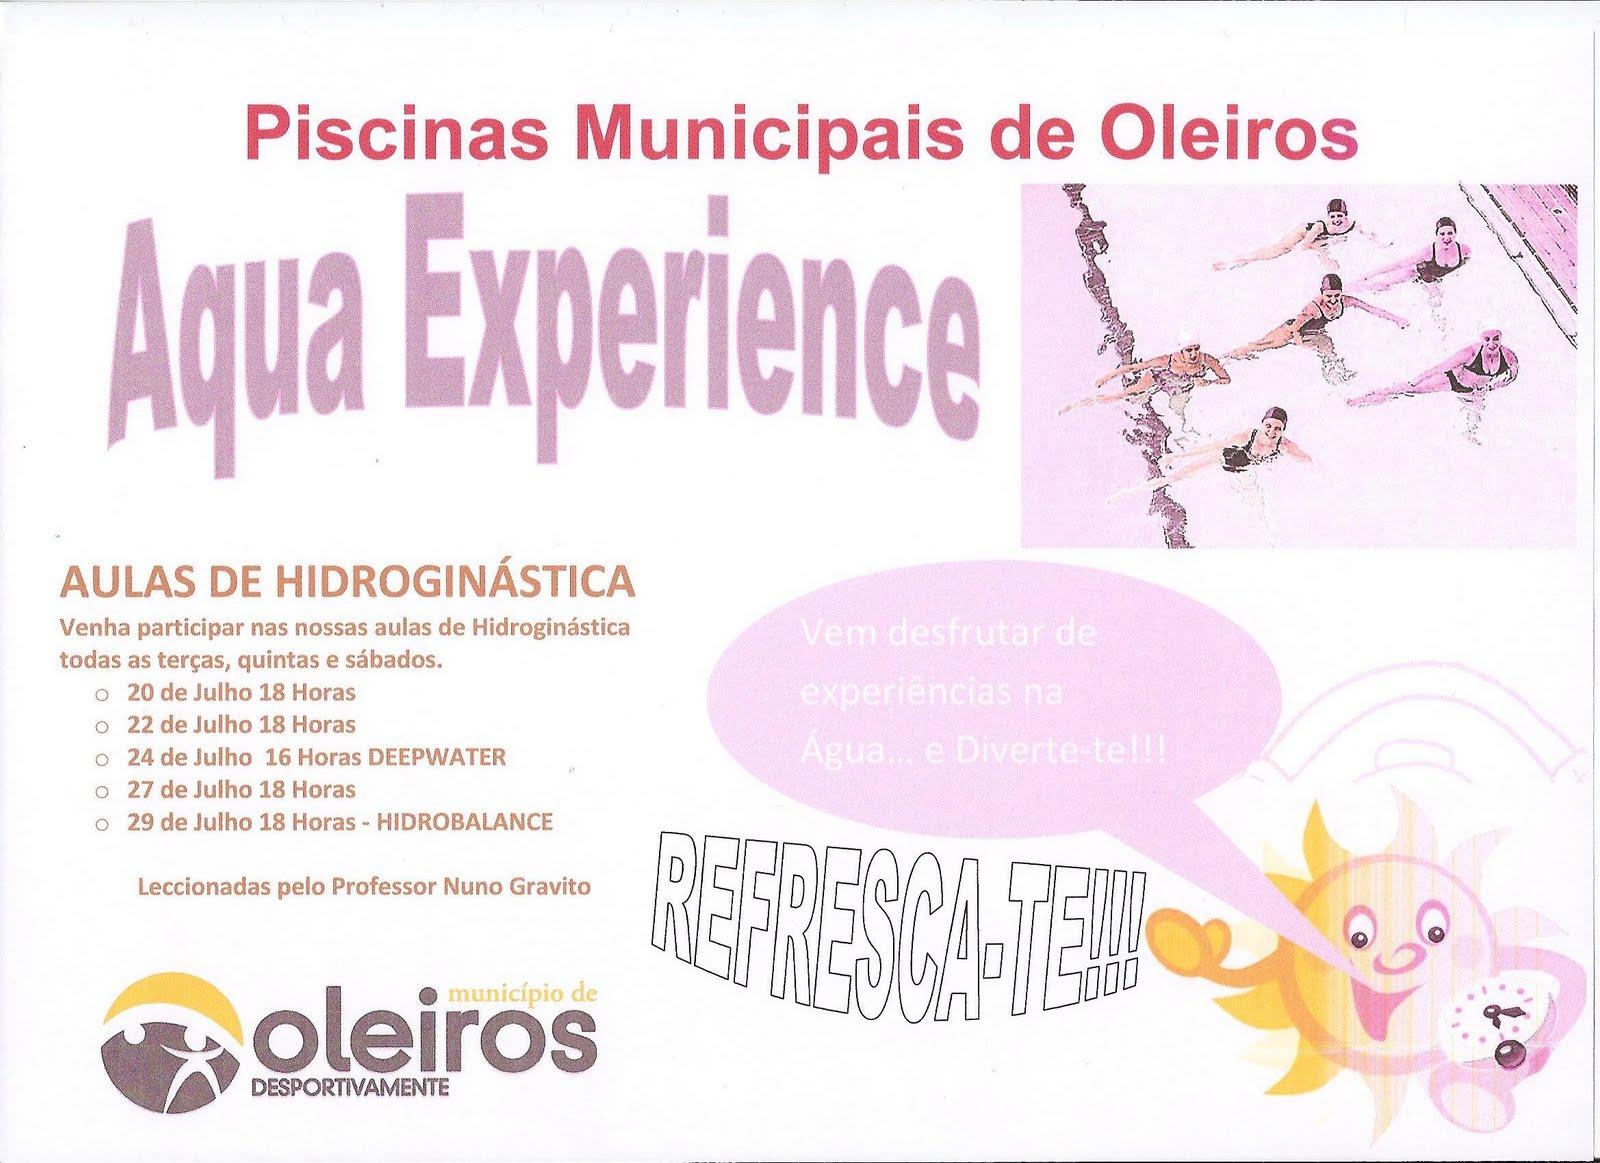 Piscinas municipais de oleiros 07 01 2010 08 01 2010 for Piscina municipal oleiros